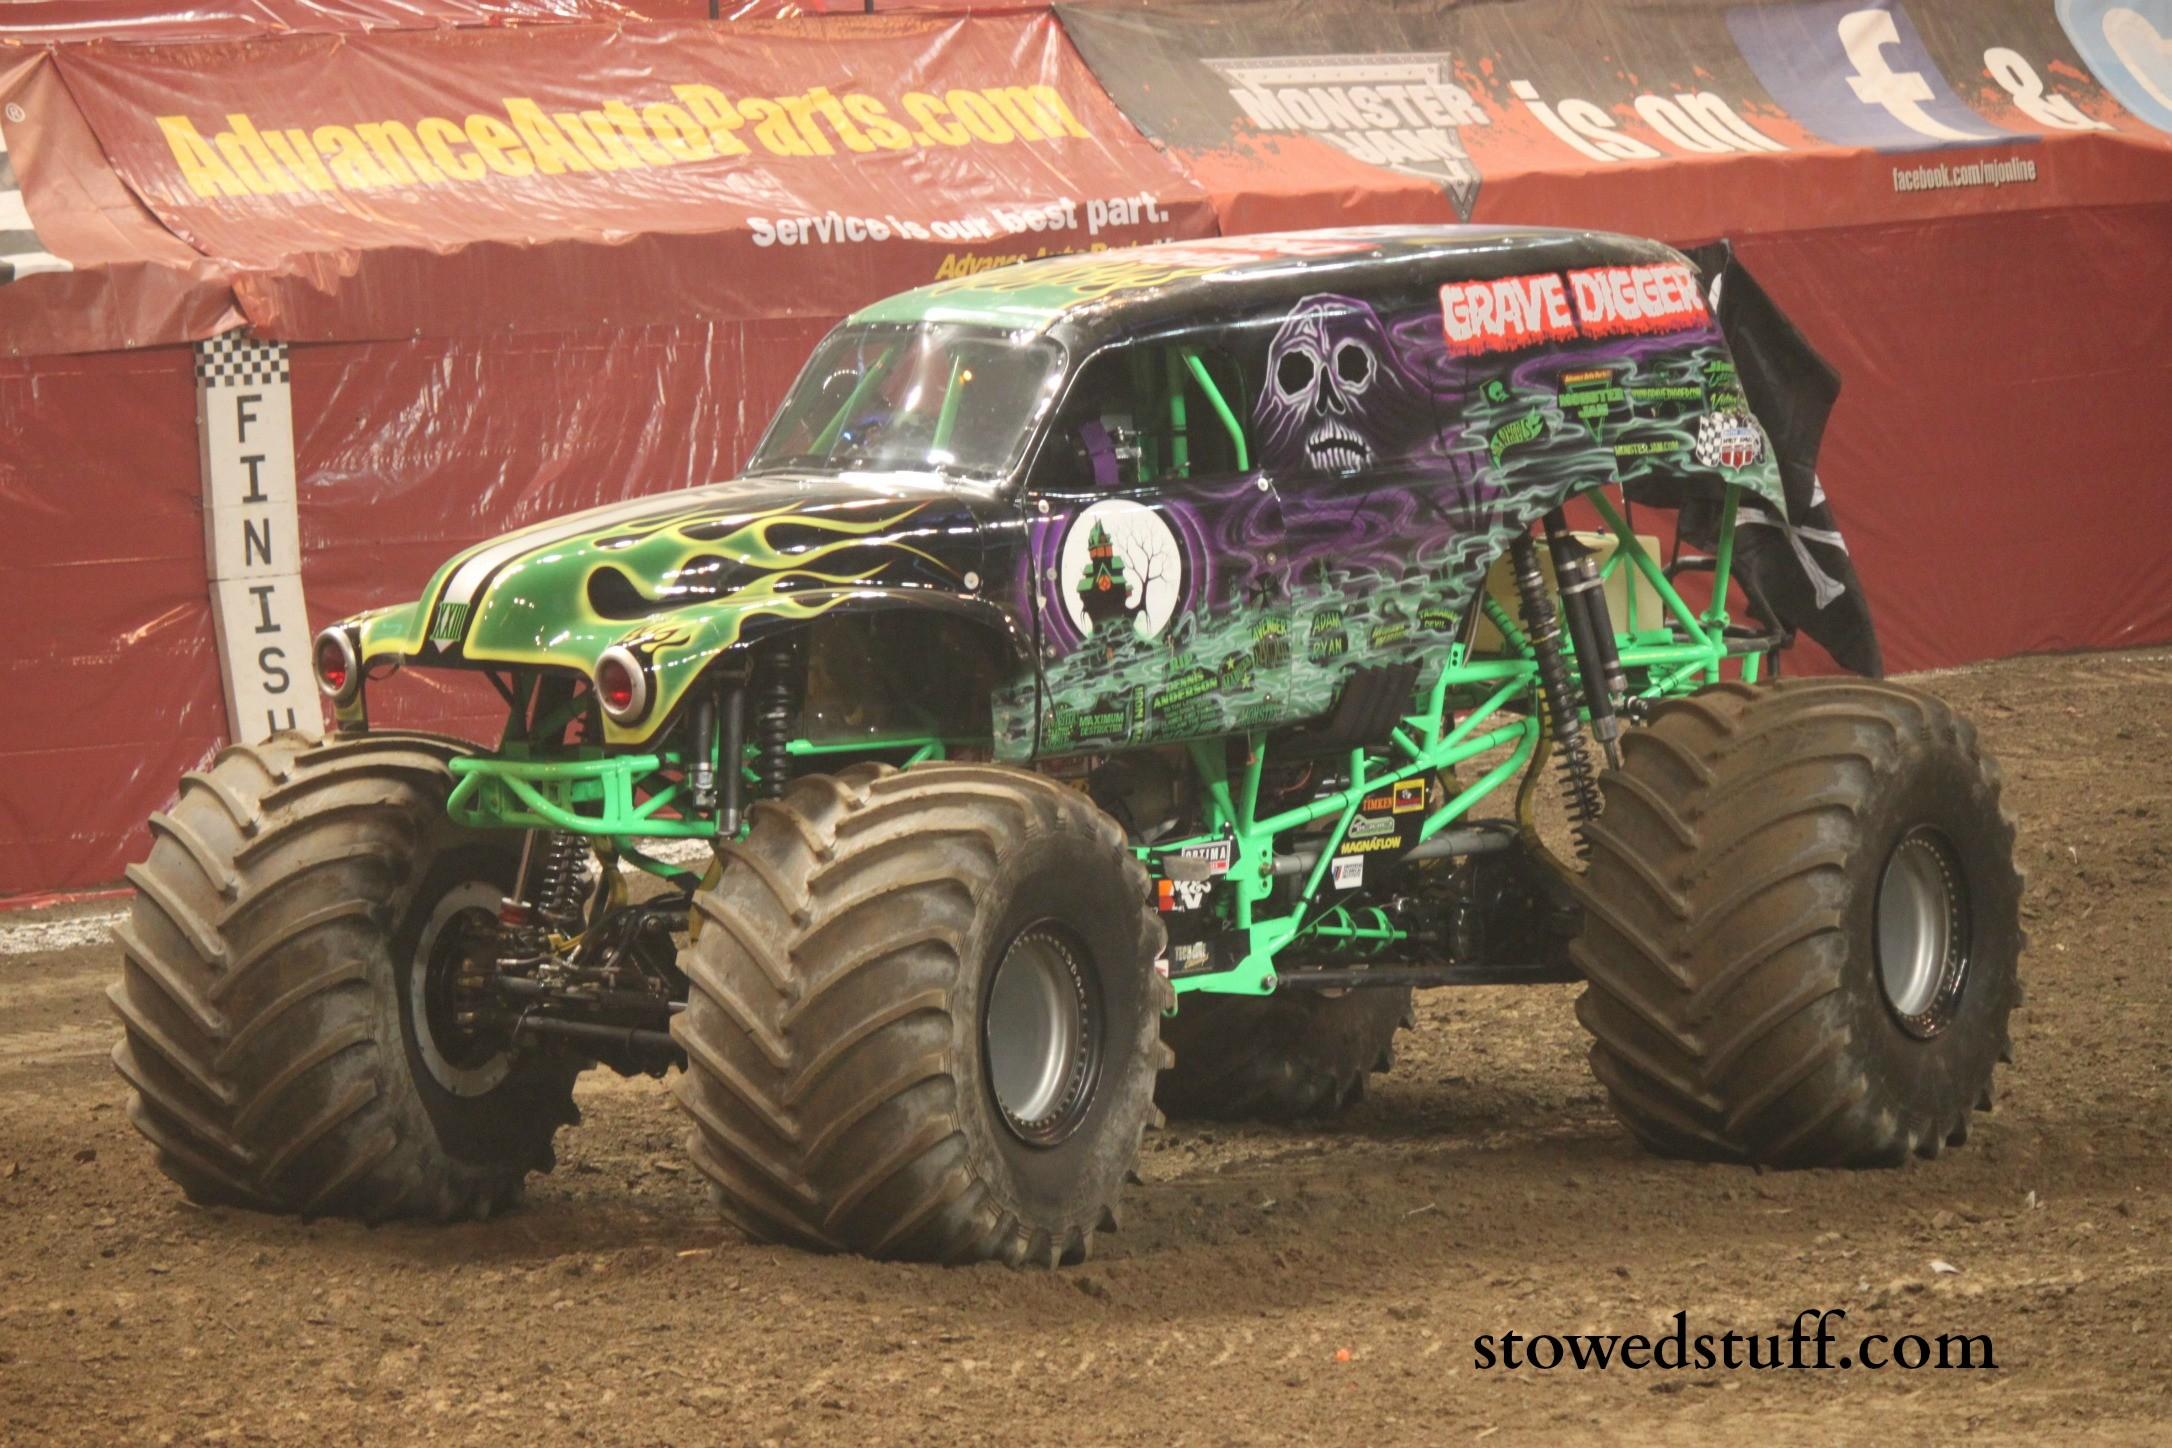 Res: 2172x1448, ... GRAVE DIGGER monster truck 4x4 race racing monster-truck g wallpaper |   | 136842 ...